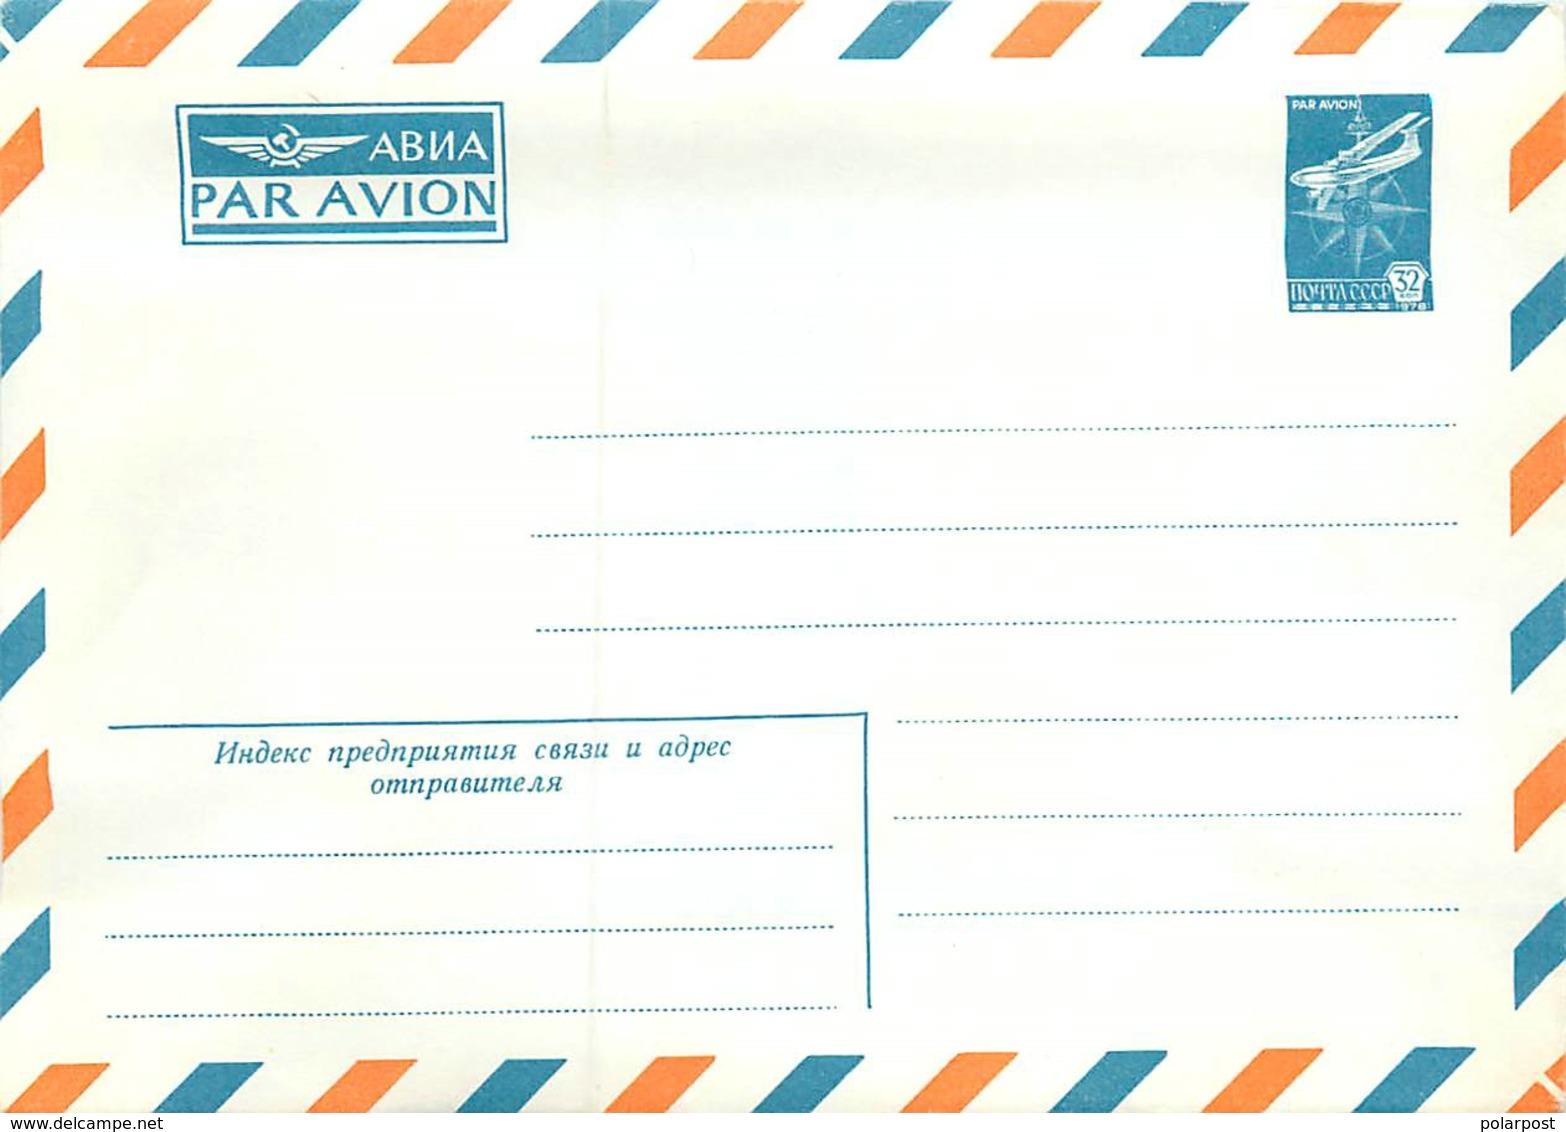 USSR 1980 AVIA PAR AVI ON IL-76 Aircraft - Covers & Documents